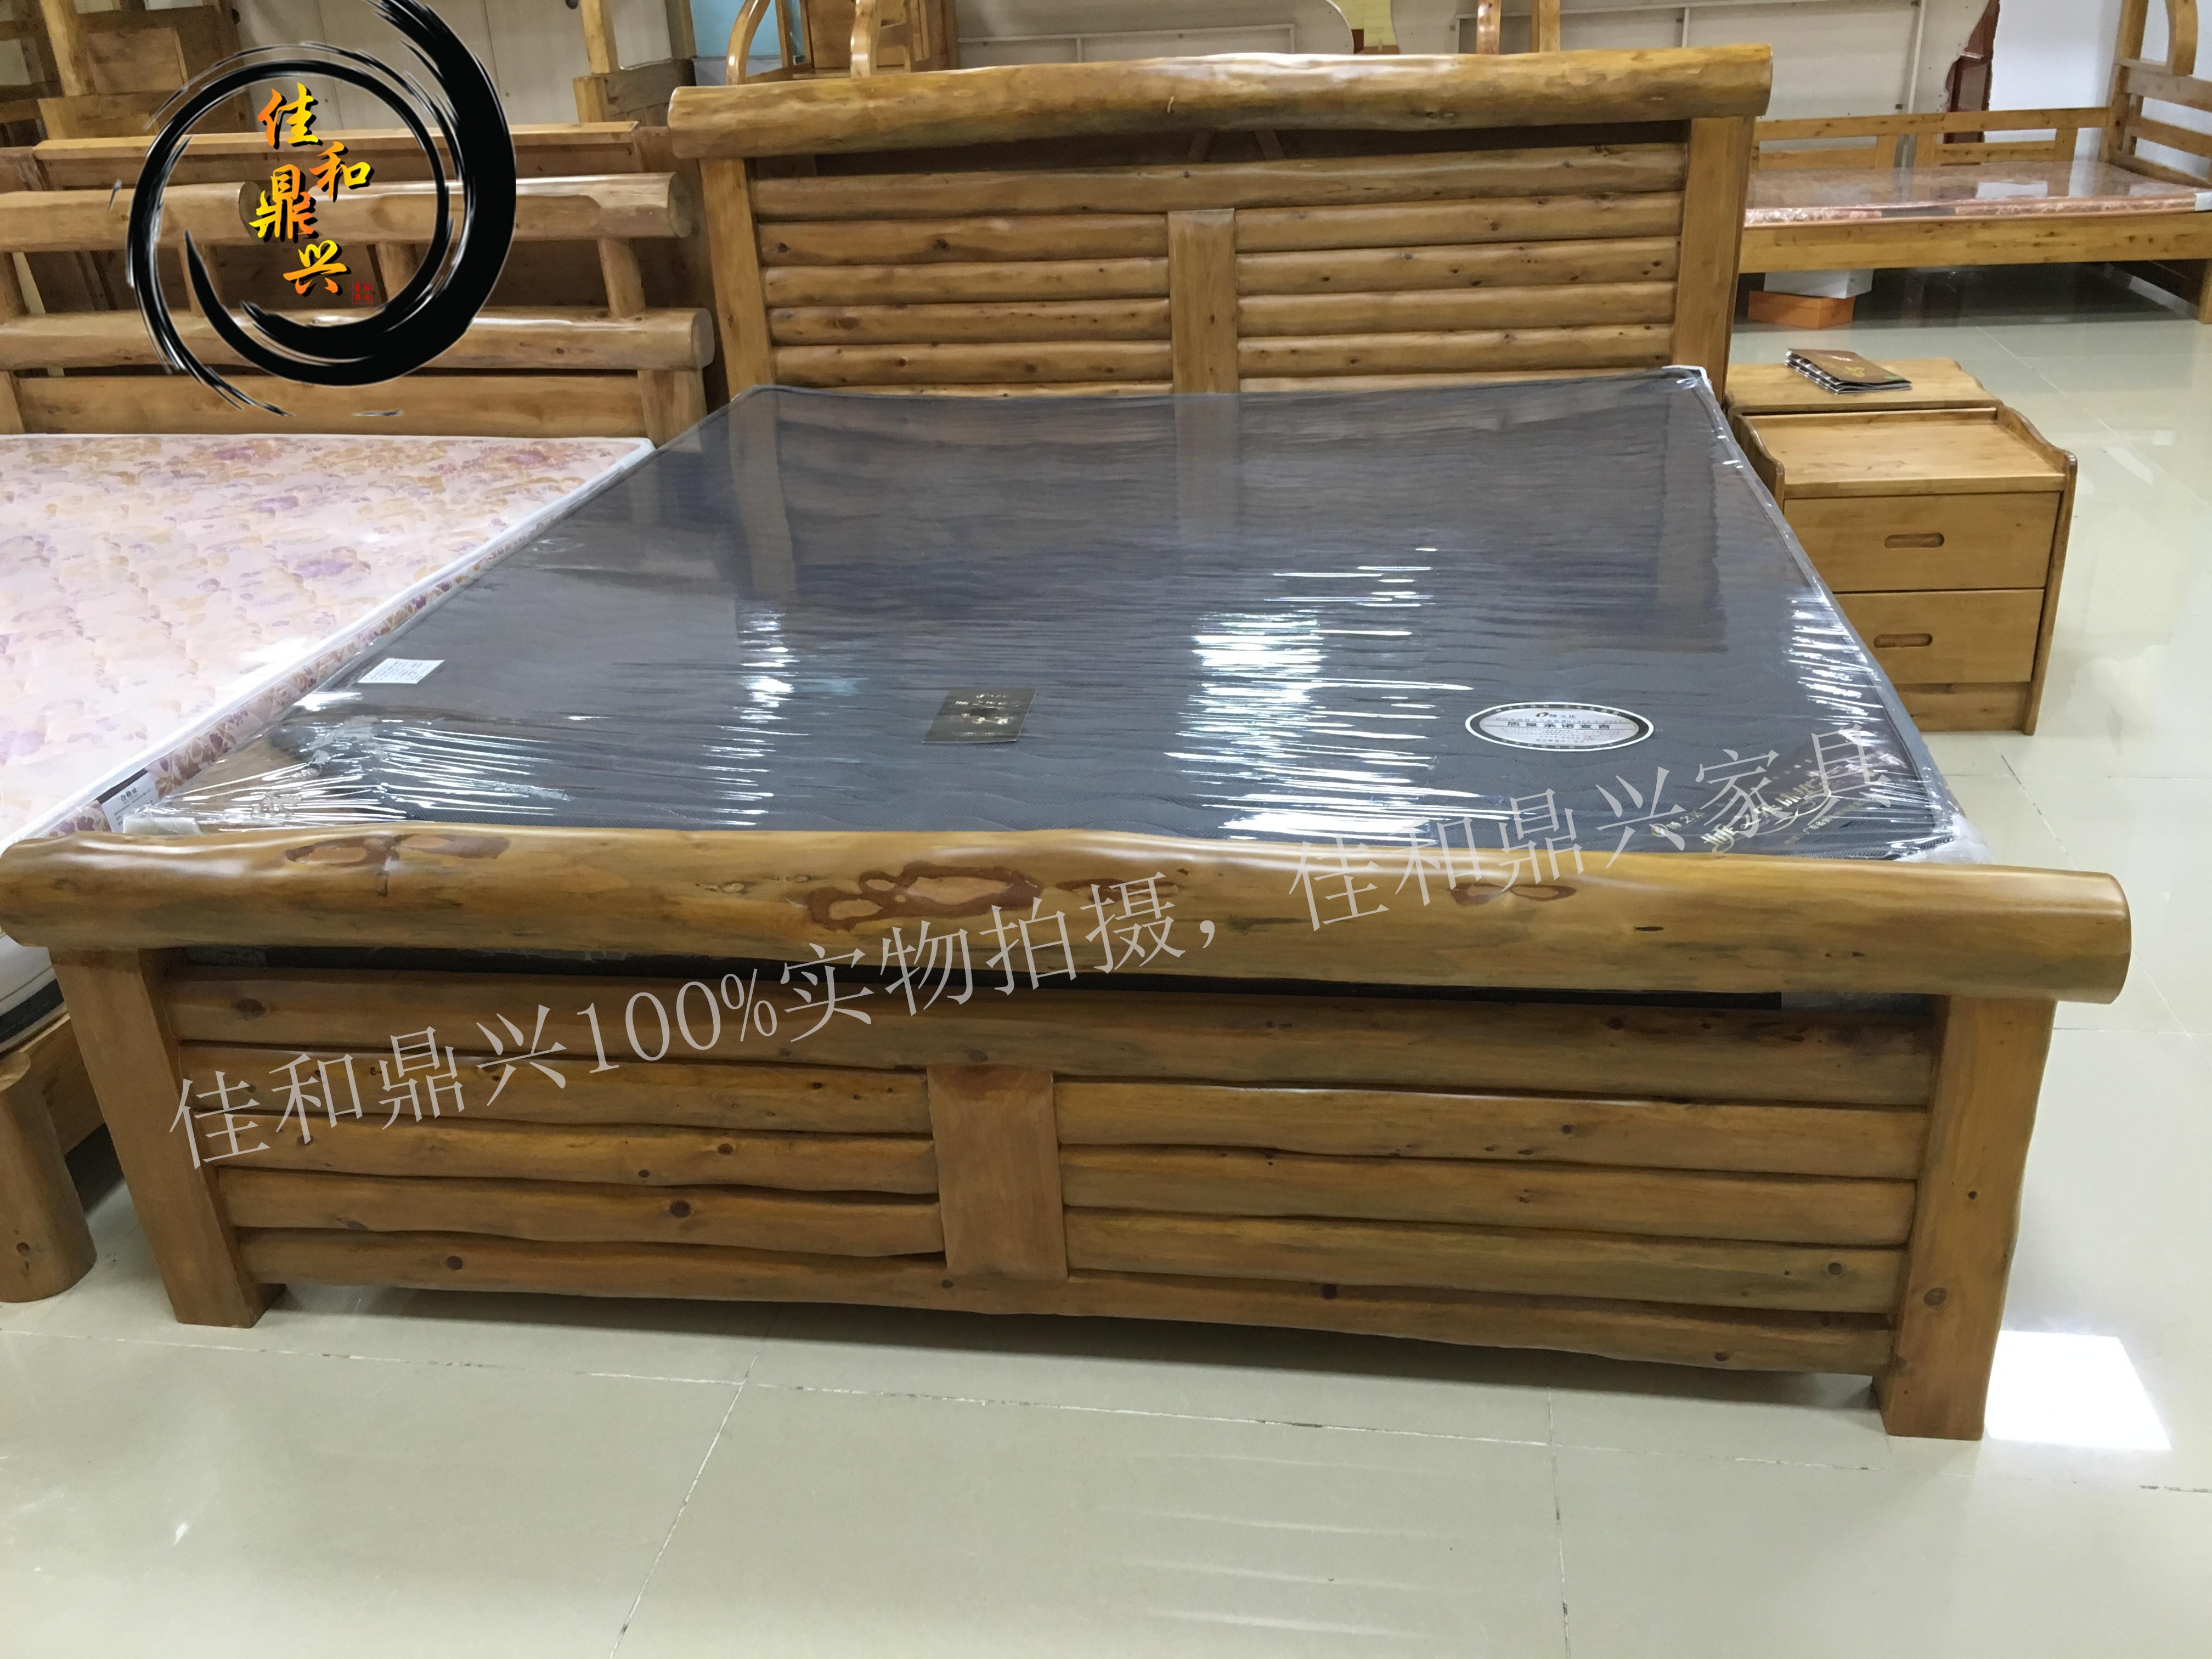 Alle massief hout bed bed cedar moderne Chinese bed cypress originele houten meubels.